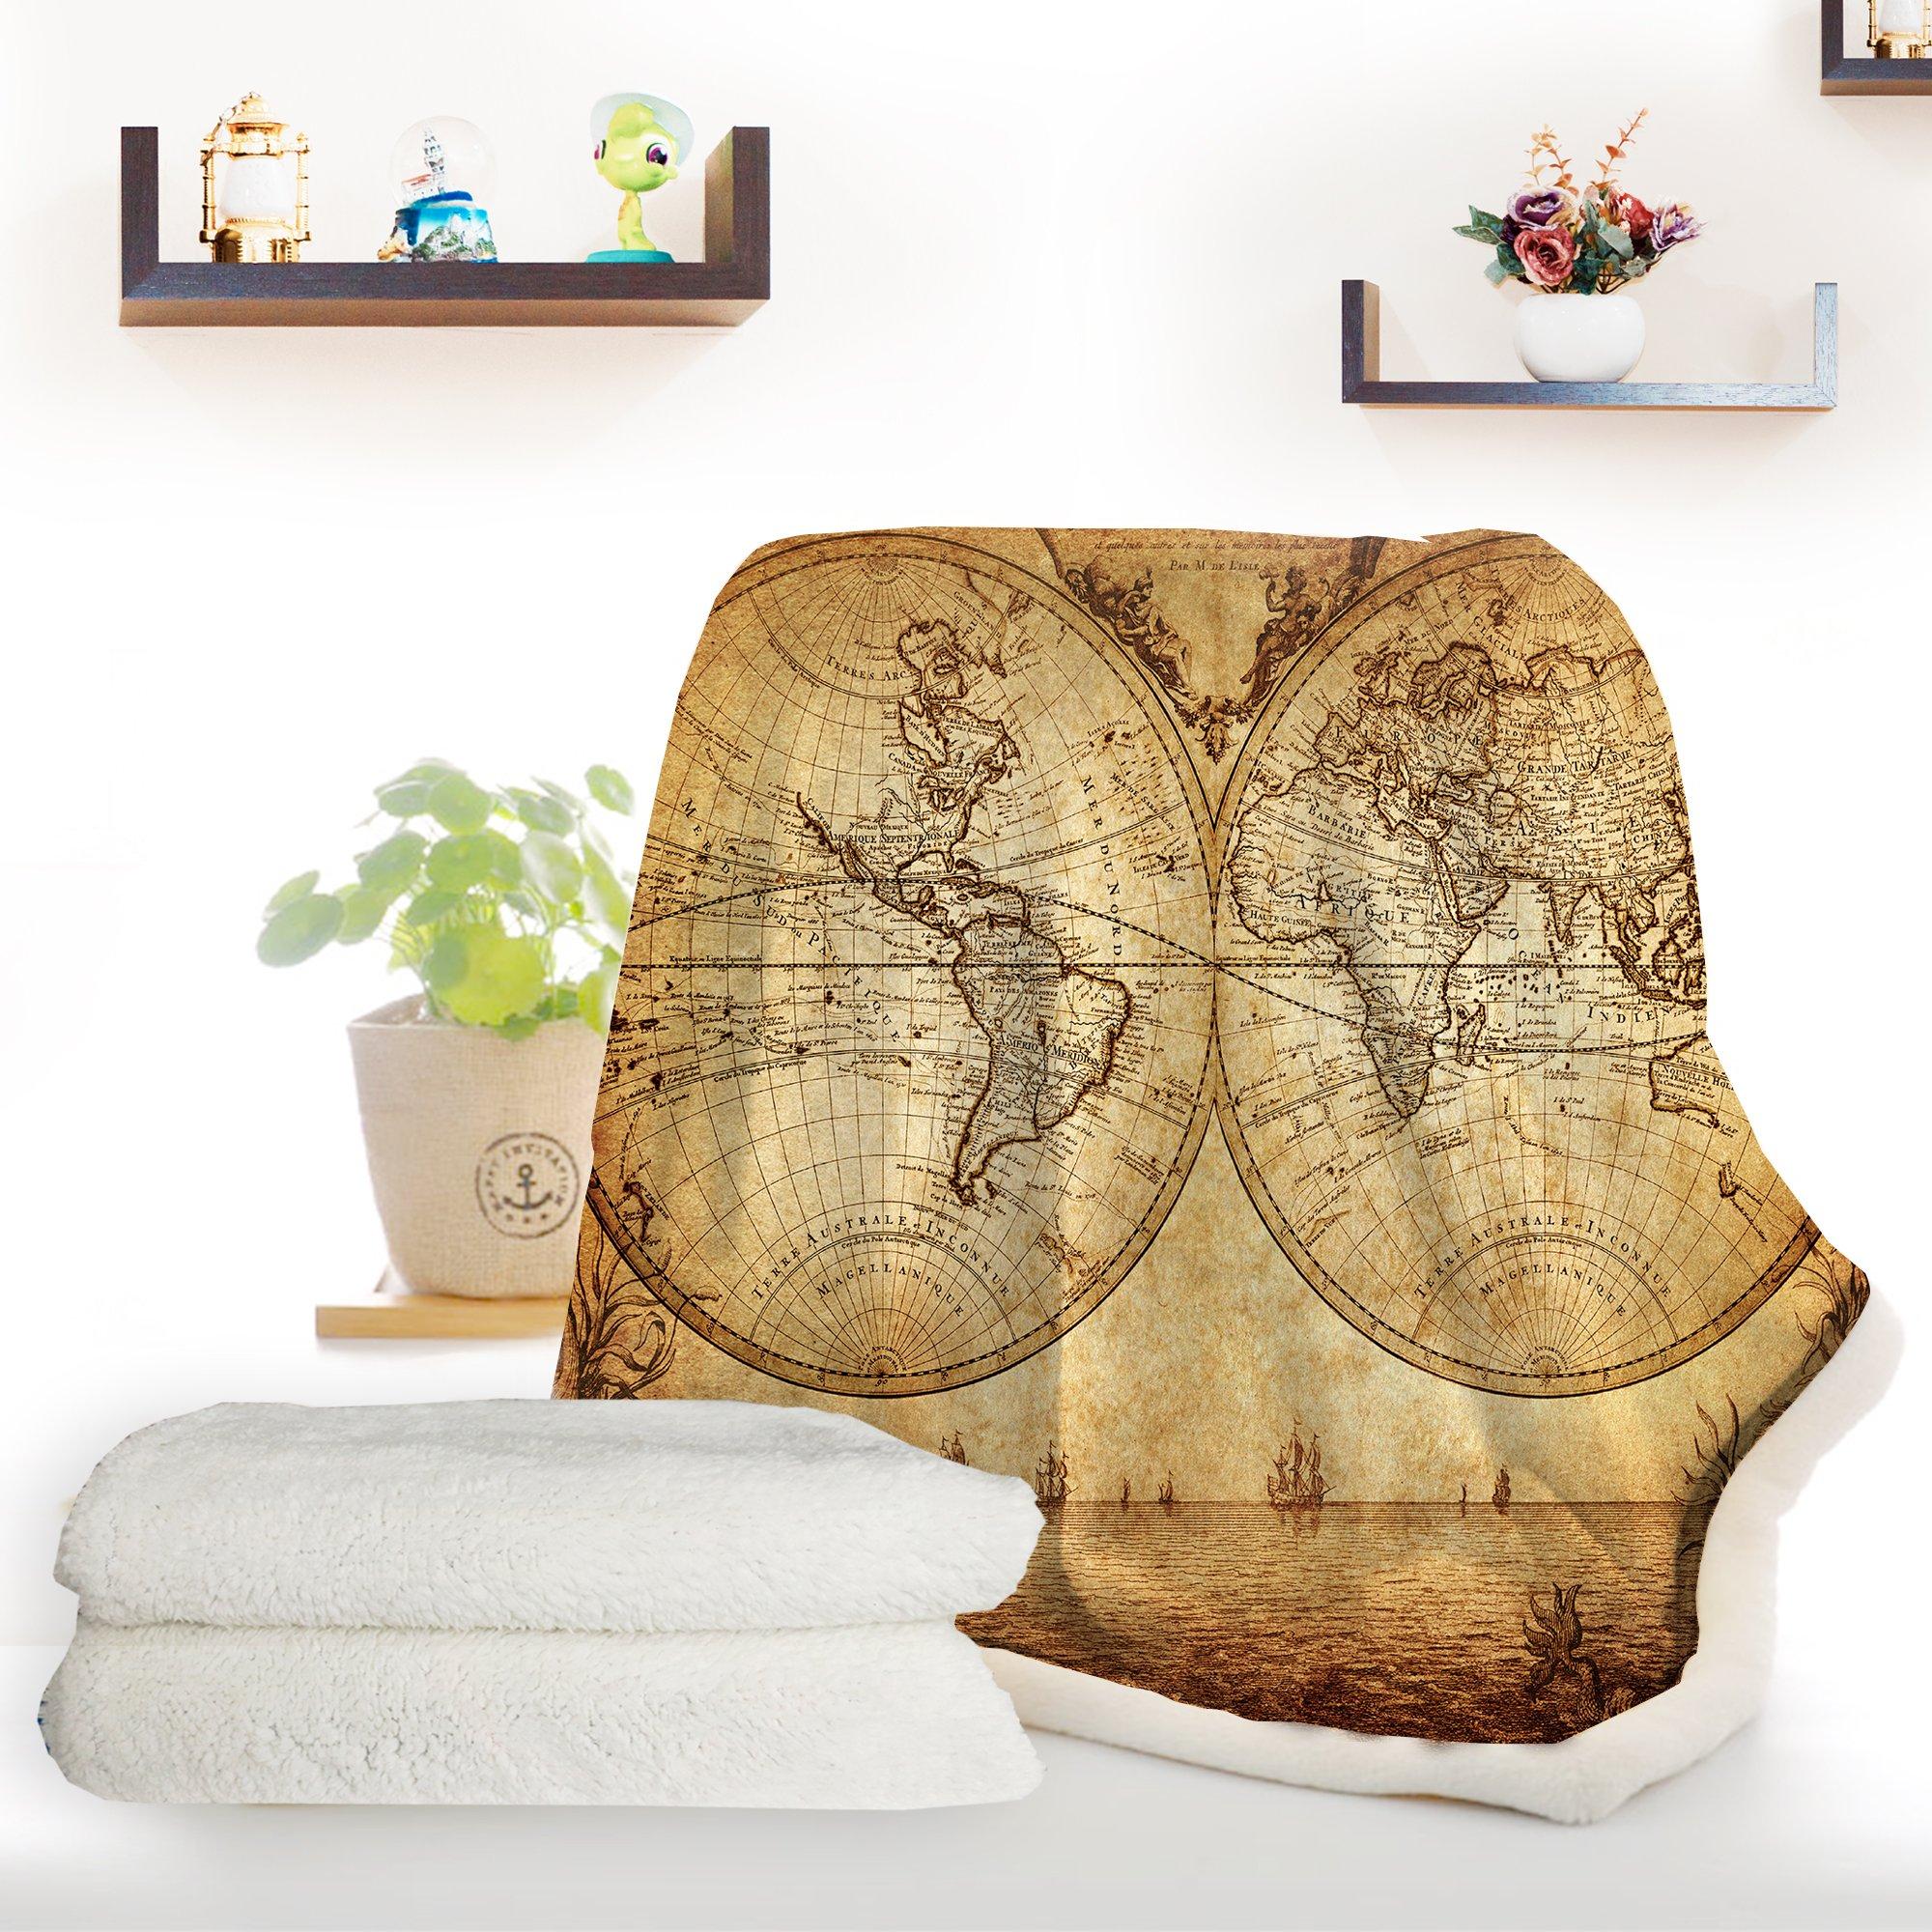 ARIGHTEX Antique Map Fleece Blanket Retro Sherpa Throw Blanket Map of The World Vintage College Dorm Blanket (50 x 60 Inches)